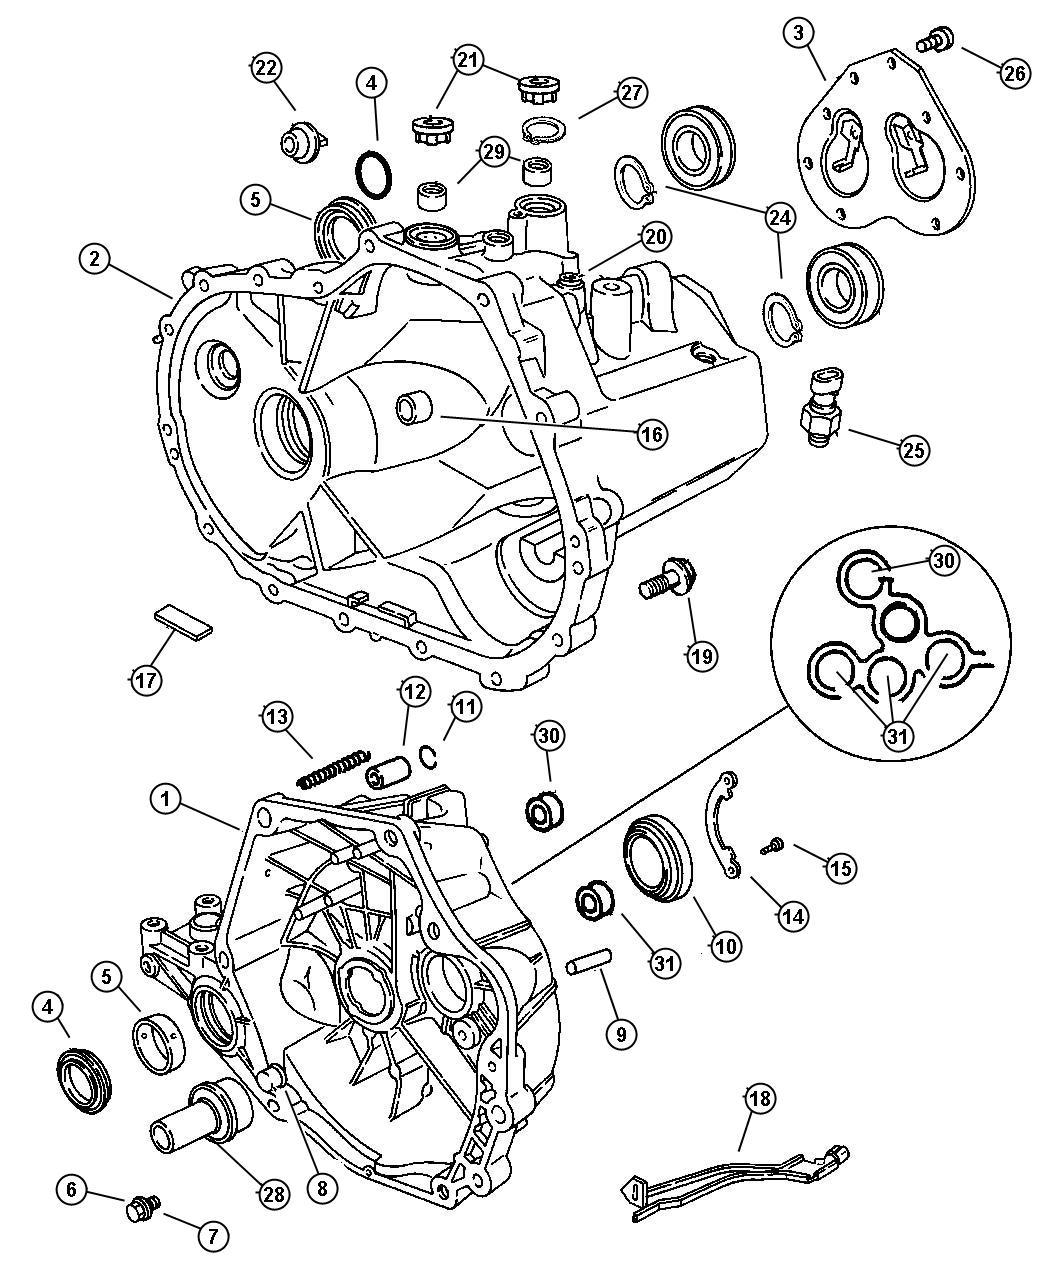 Chrysler Cirrus LX Bearing package. Output shaft